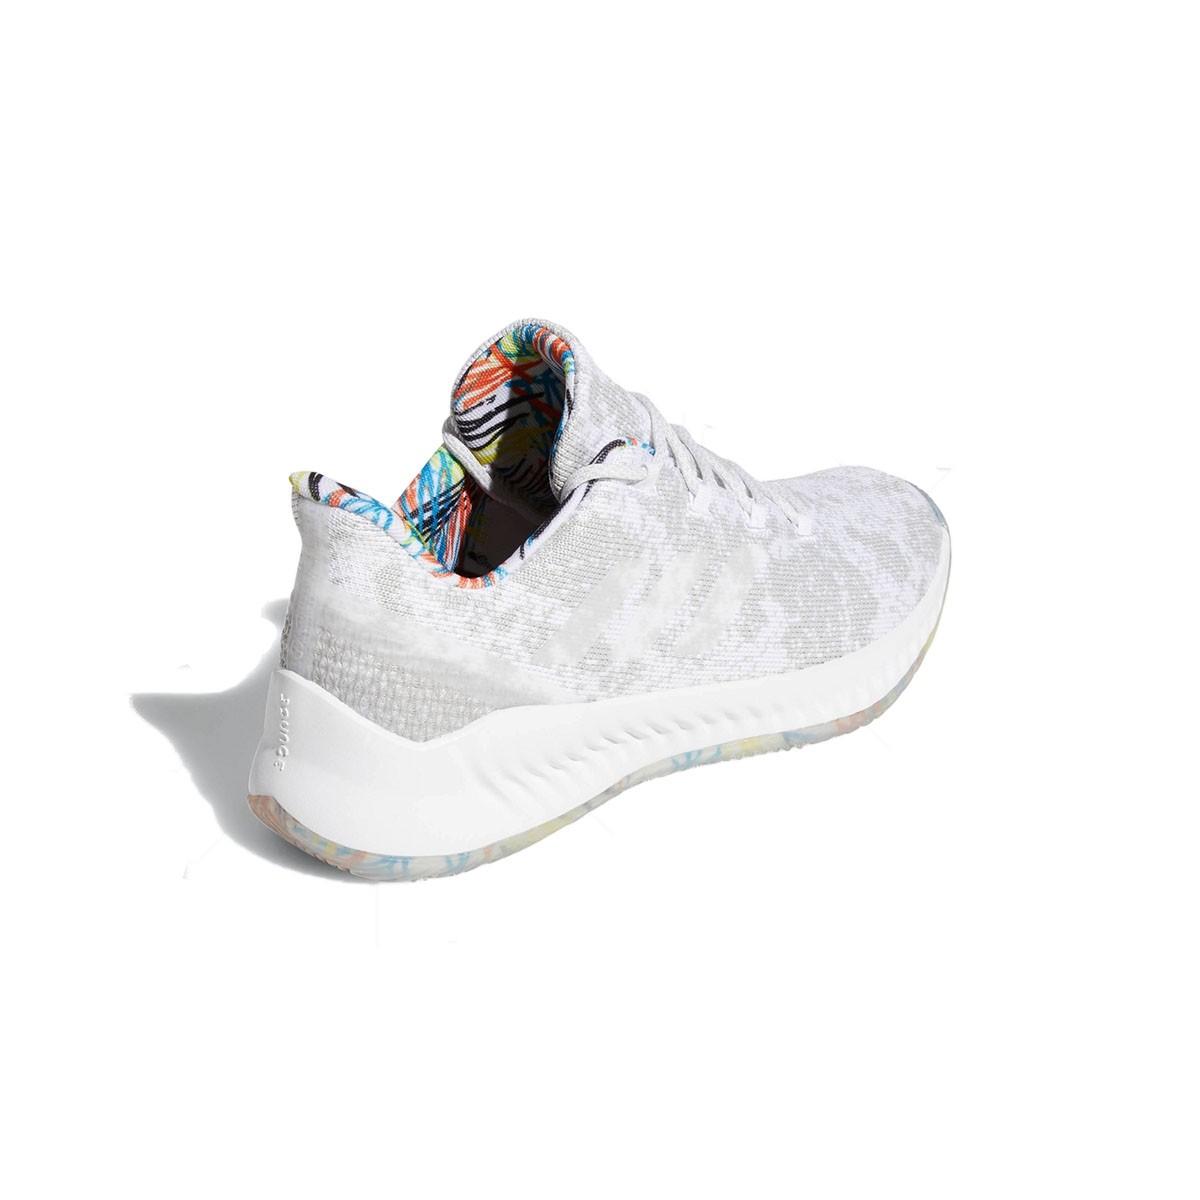 ADIDAS Harden BE X 'White Multicolor'